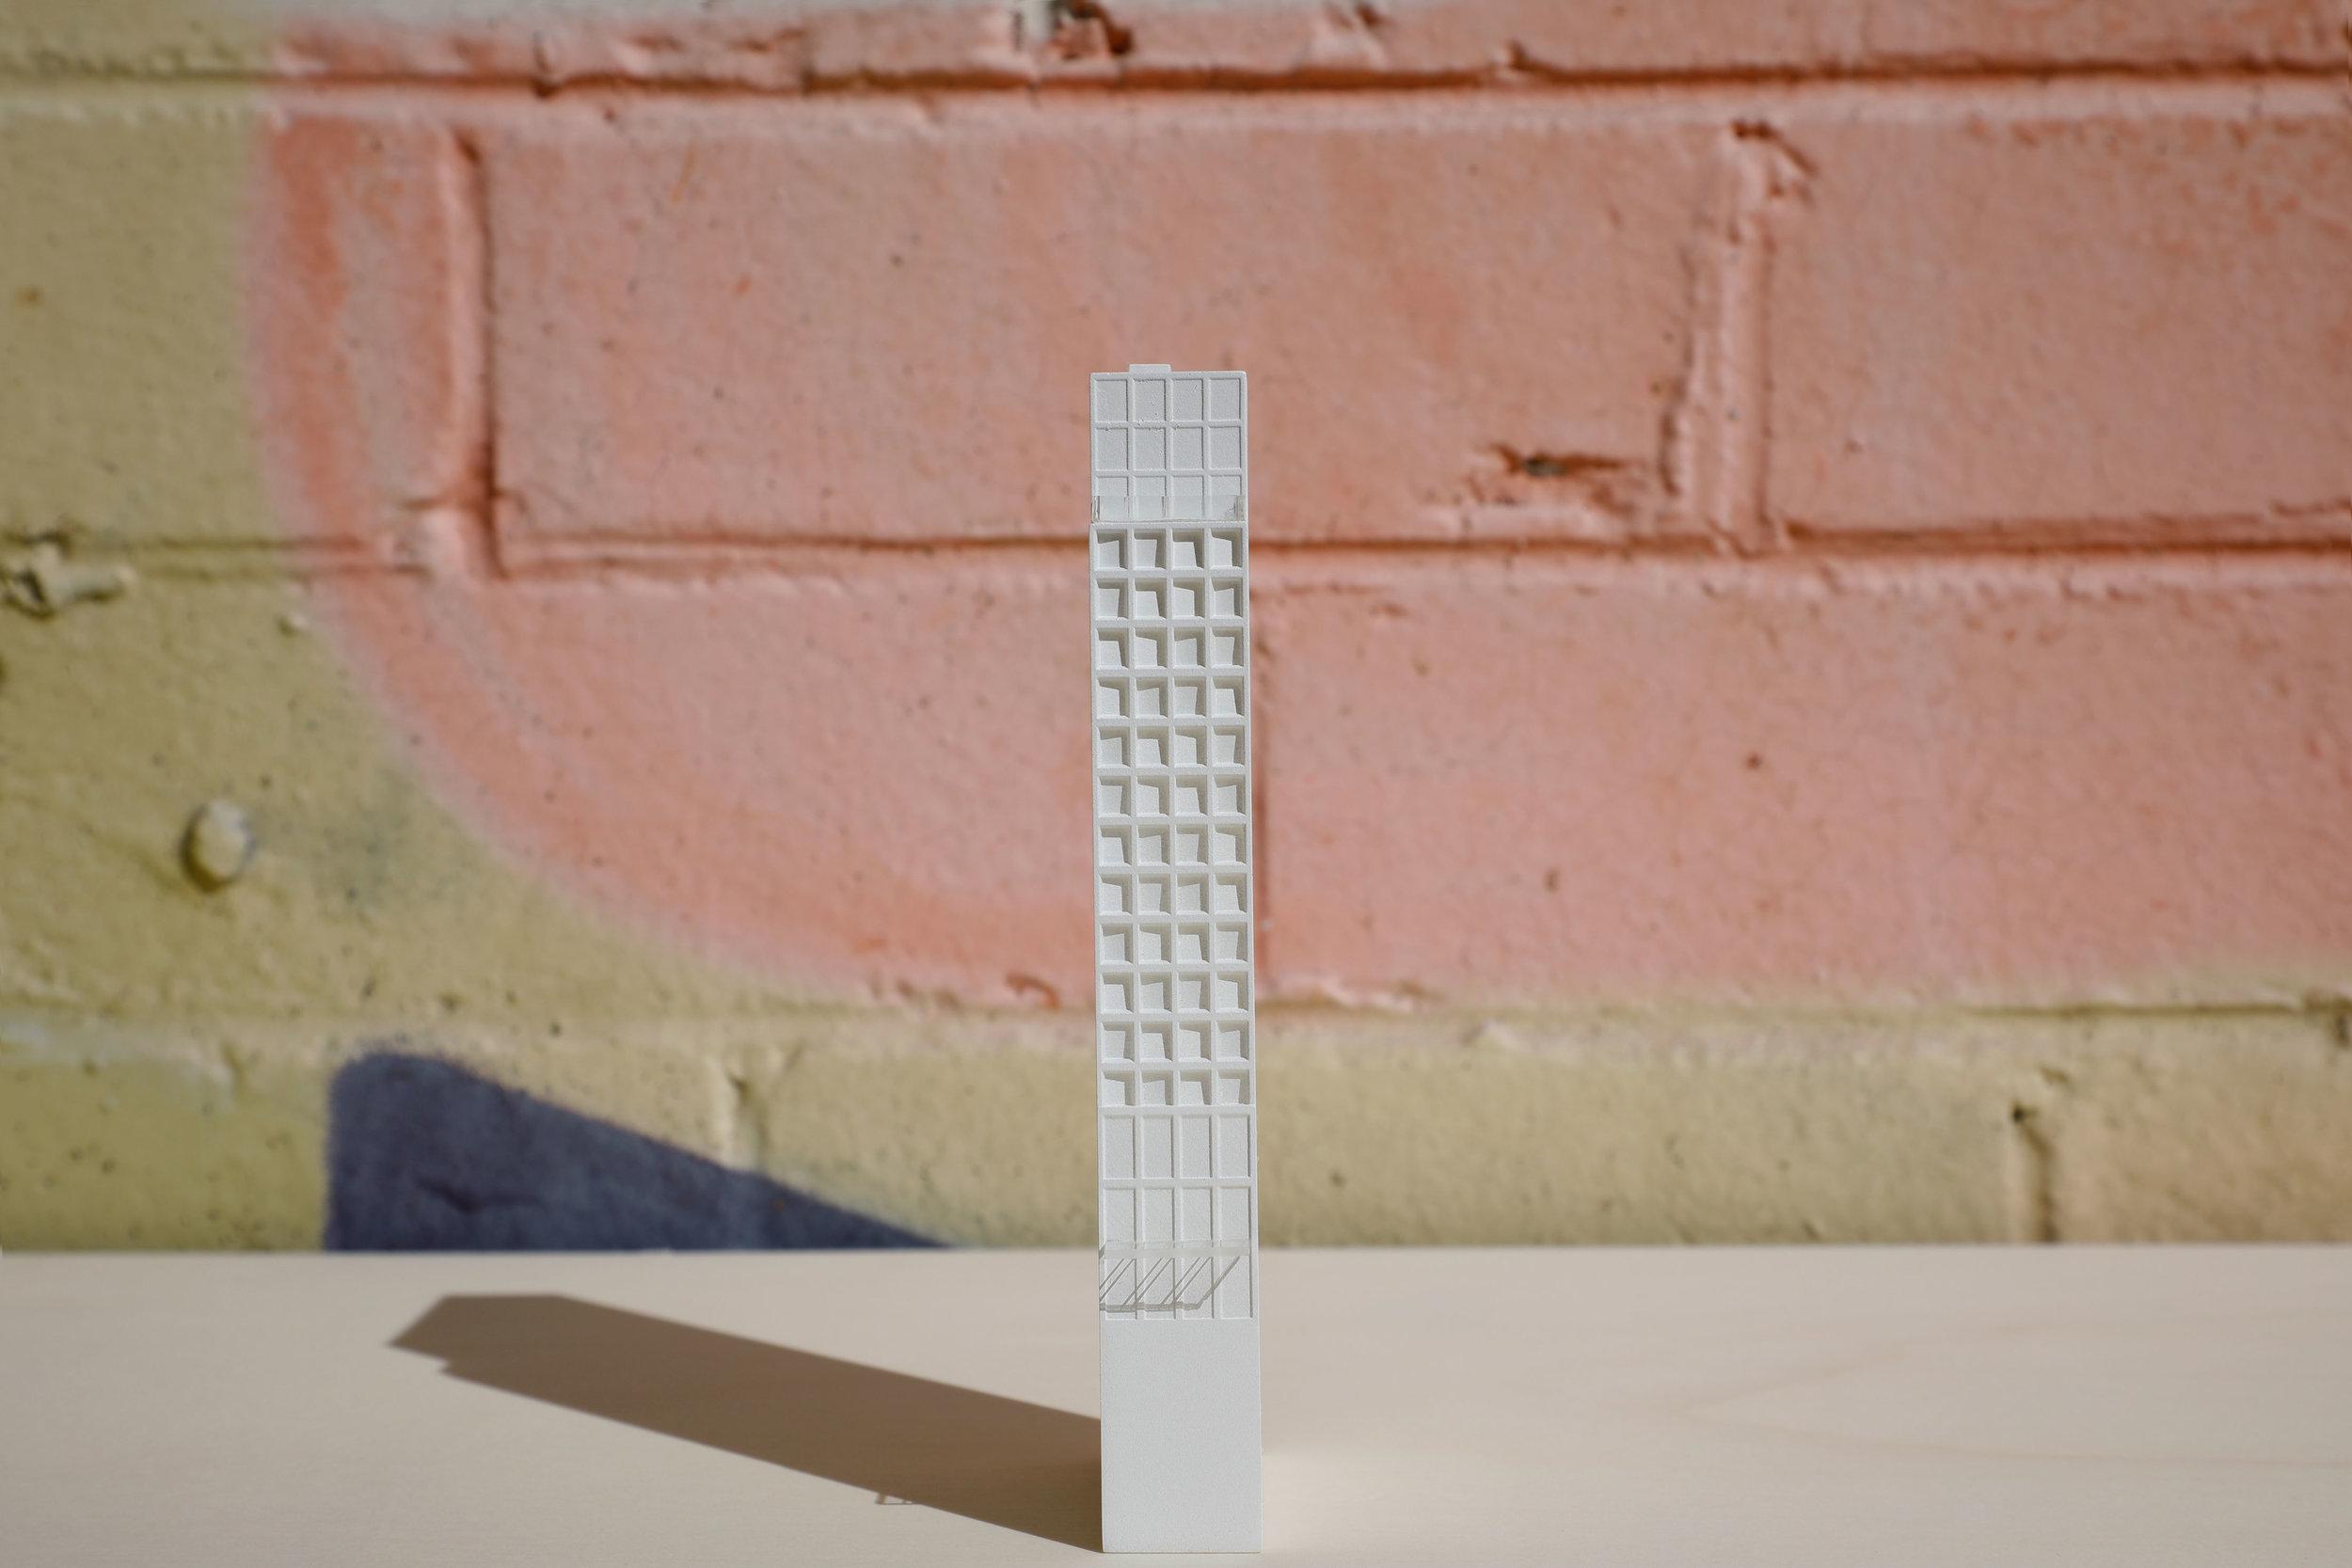 DA_Architecture_sydney_COS_3Dprinting_make_models_13.jpg